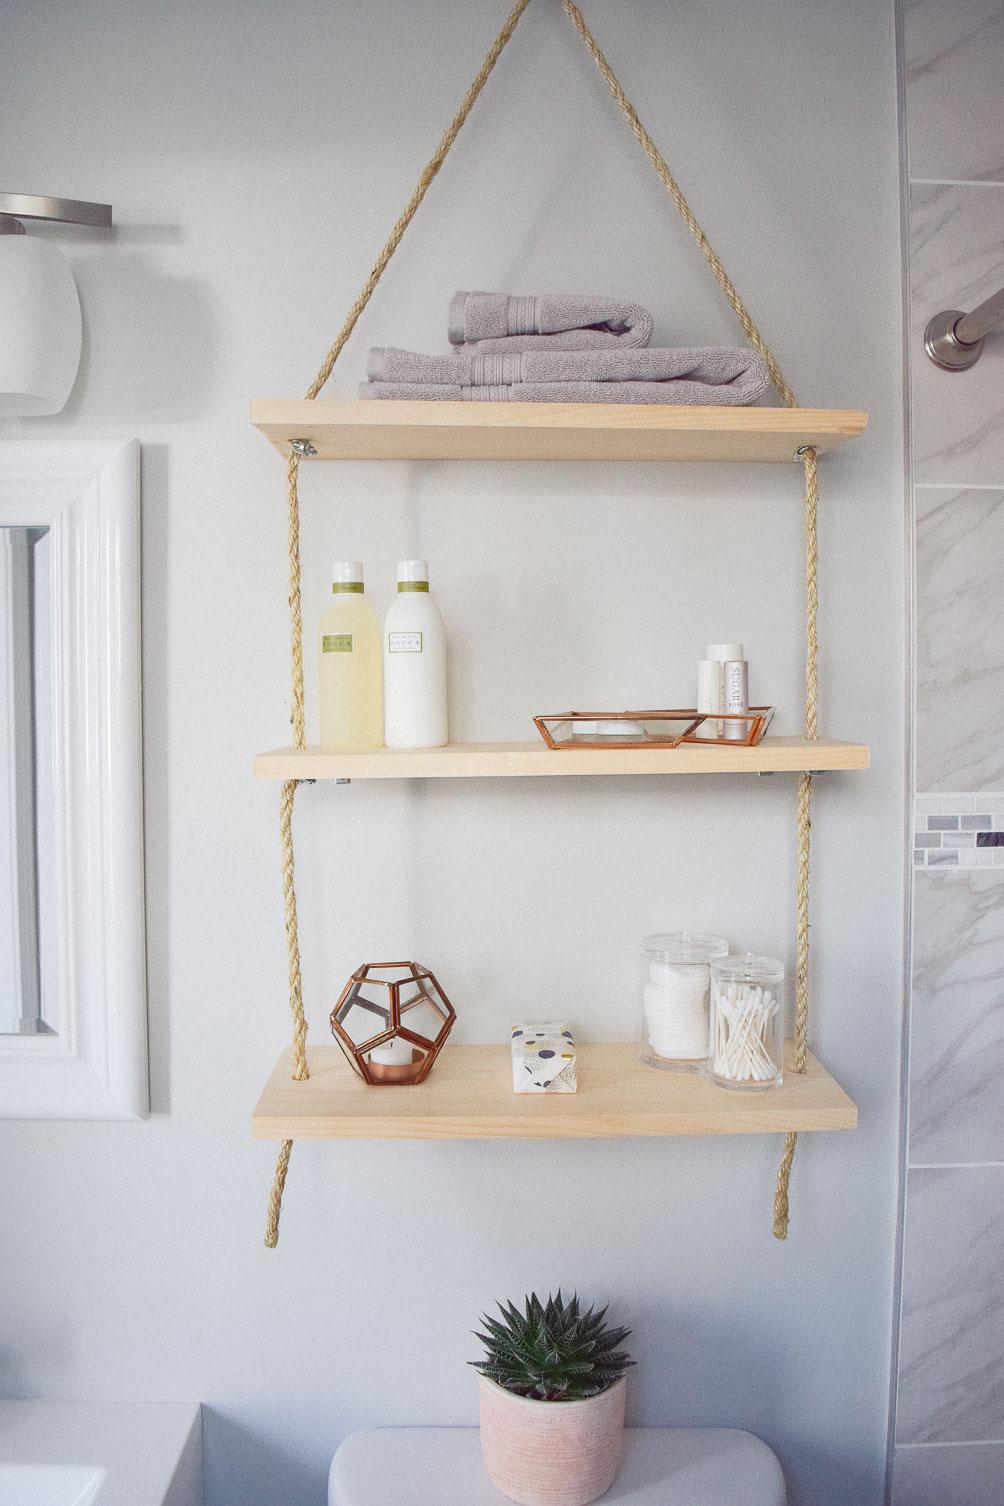 Divine Sharing An Idea To Update Home Decor Diy Hanging Shelves Bathroomstorage Diy Hanging Shelves One Brass Fox Bathroom Hanging Shelf Unit Steel Hanging Bathroom Shelf bathroom Bathroom Hanging Shelf